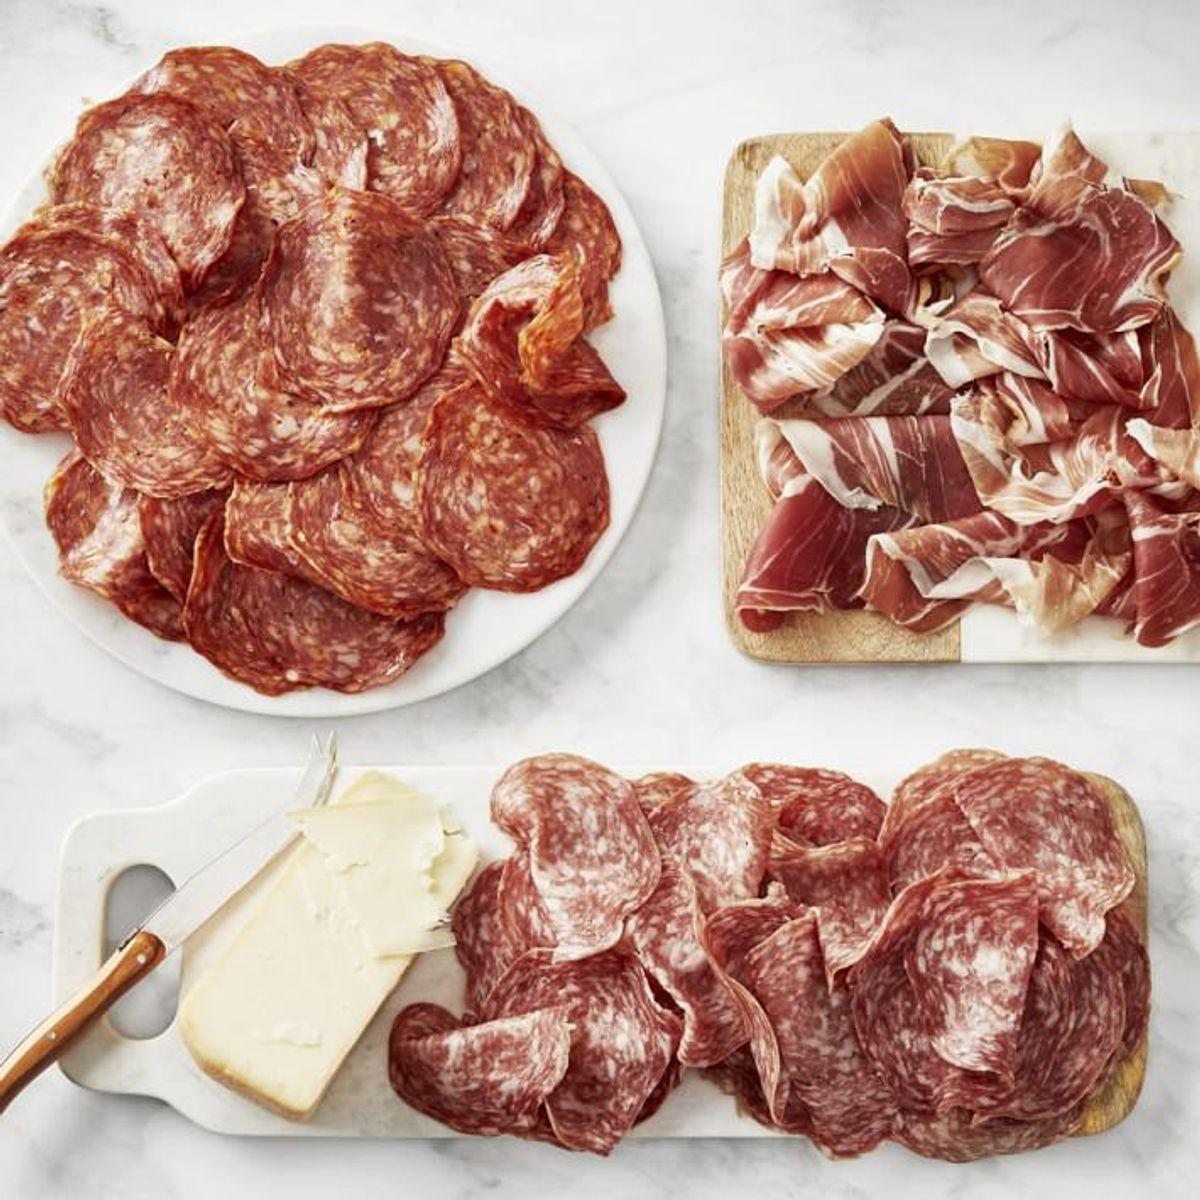 williams sonoma ultimate cured meat sampler